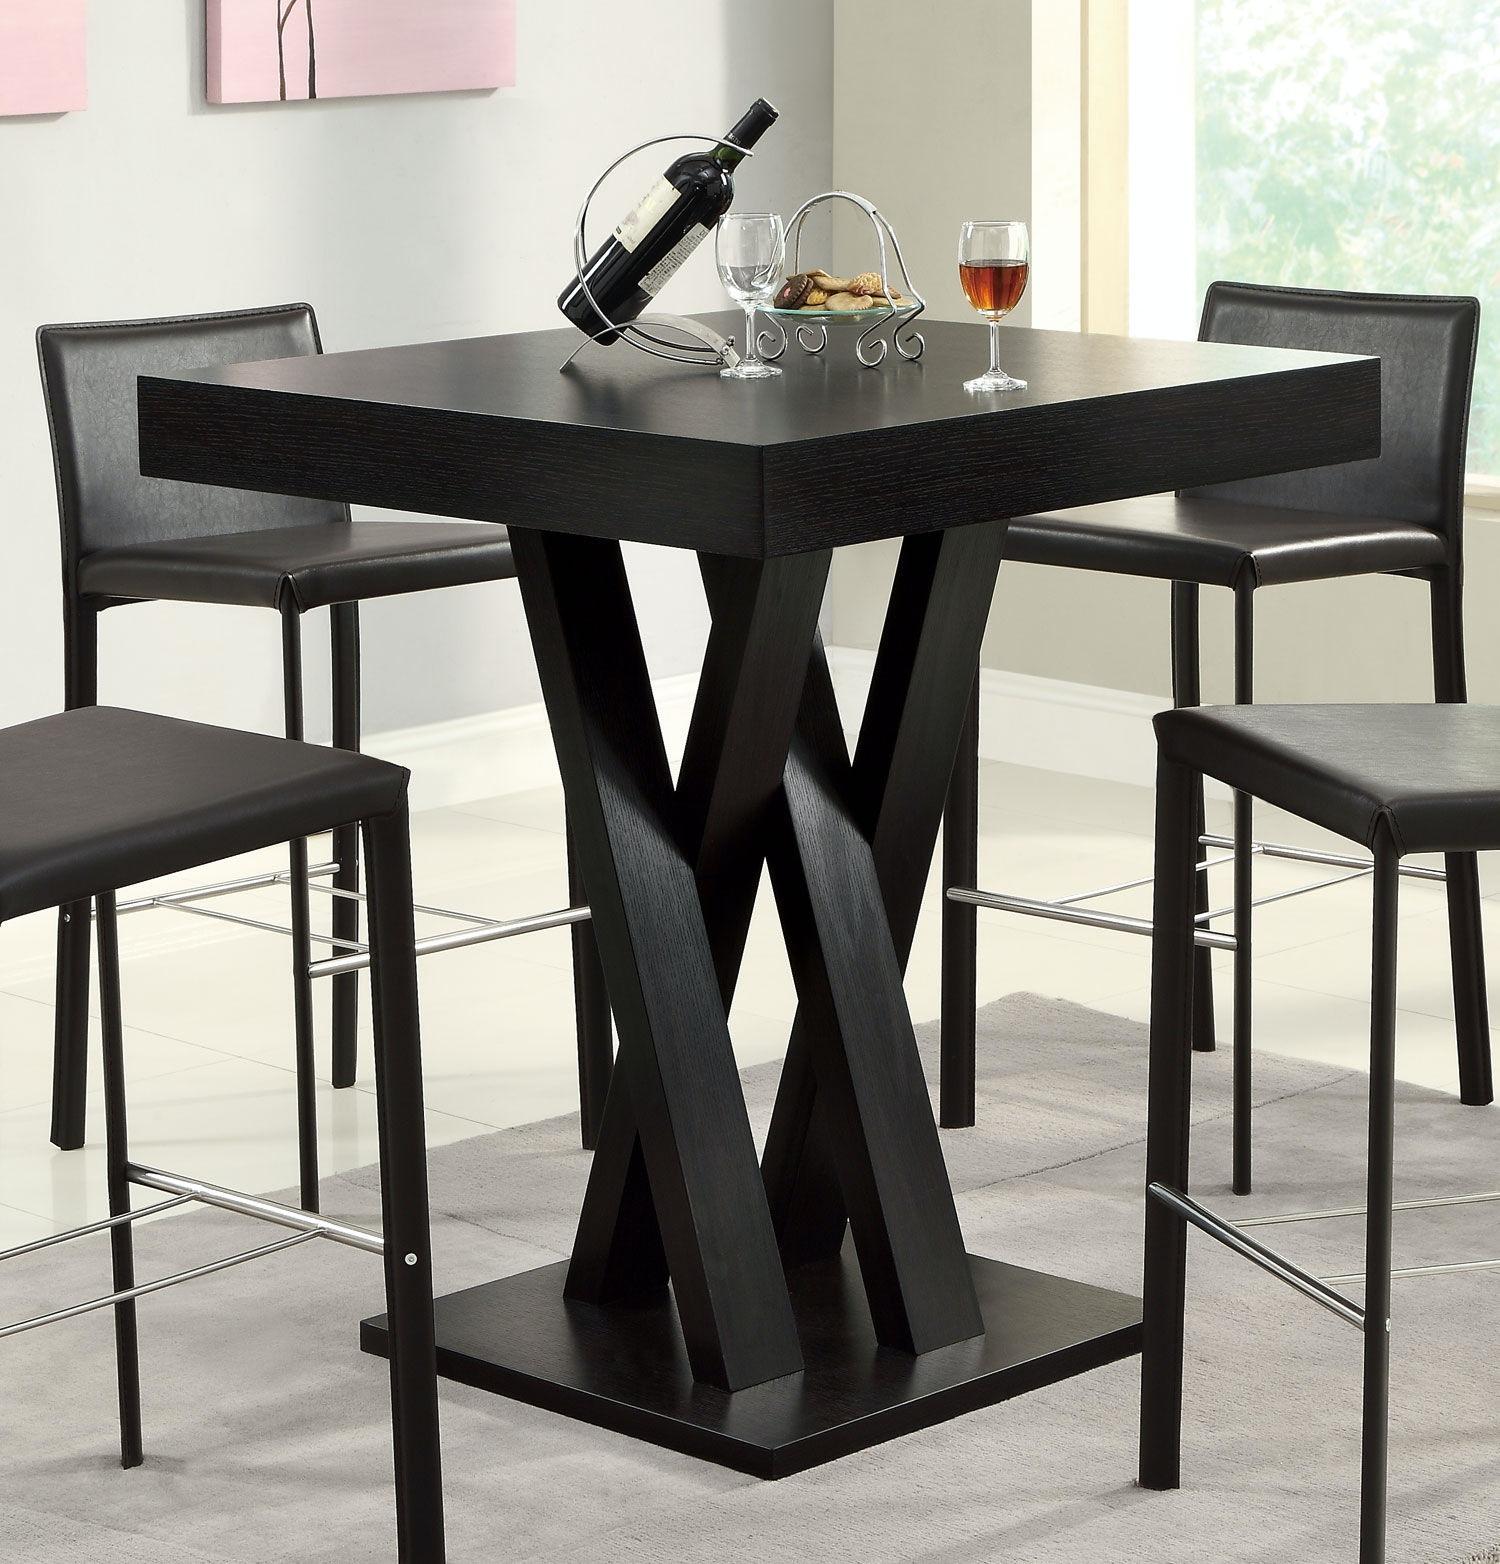 Coaster Bar Table 100520; Coaster Bar Table 100520 ...